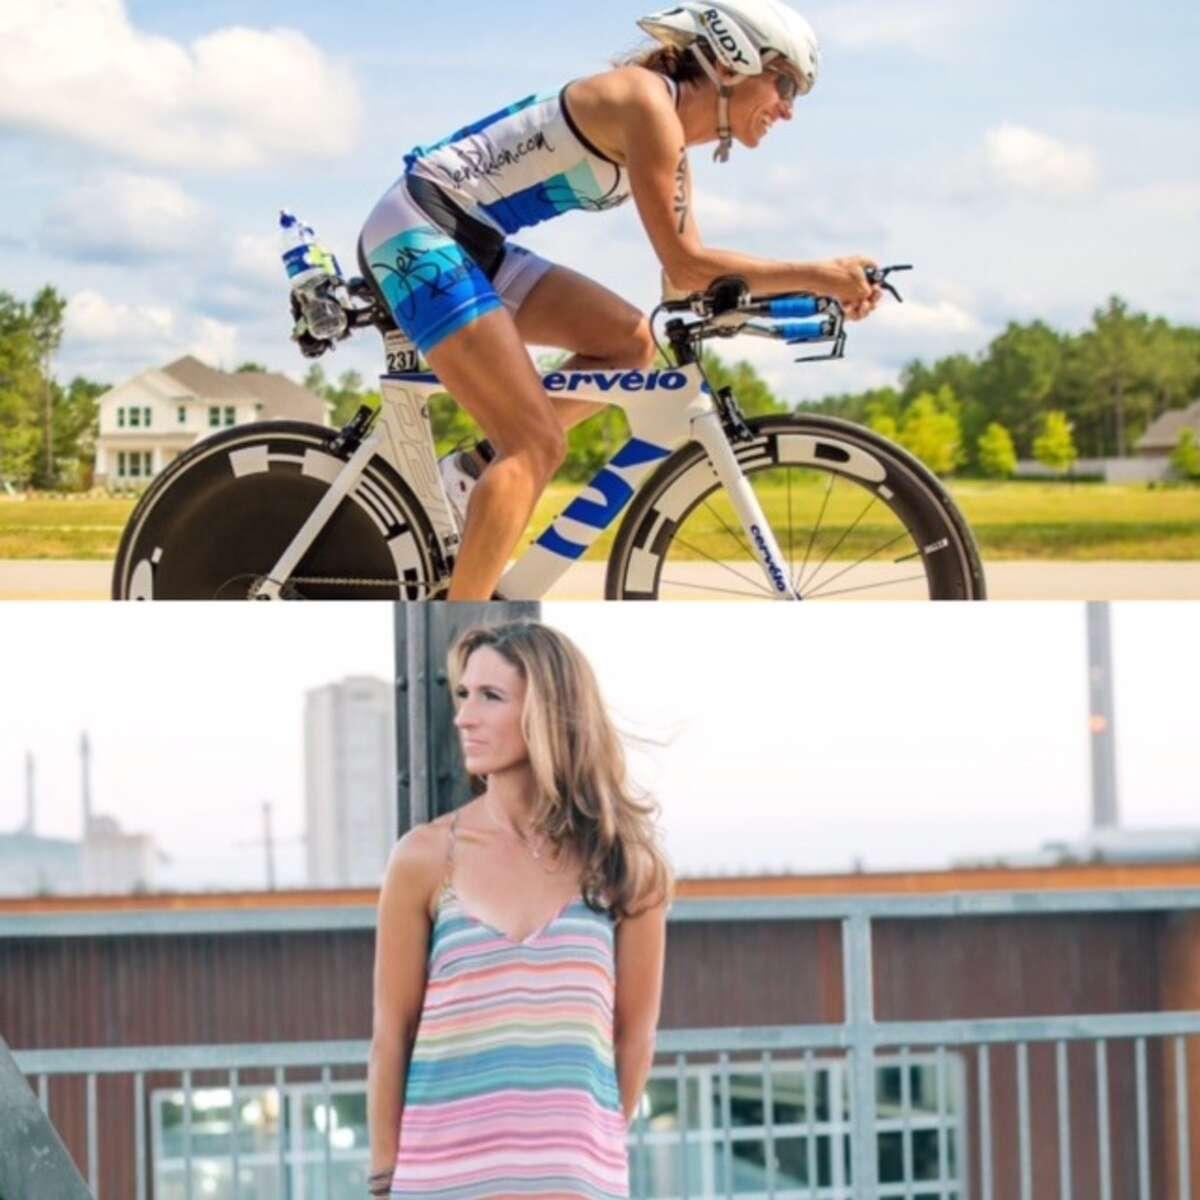 Jen Rulon The Tribe Strength and Conditioning Training thetribesc.com Specialty:Swim, bike, run and strength training for triathletes Instagram: @CoachJenRulon